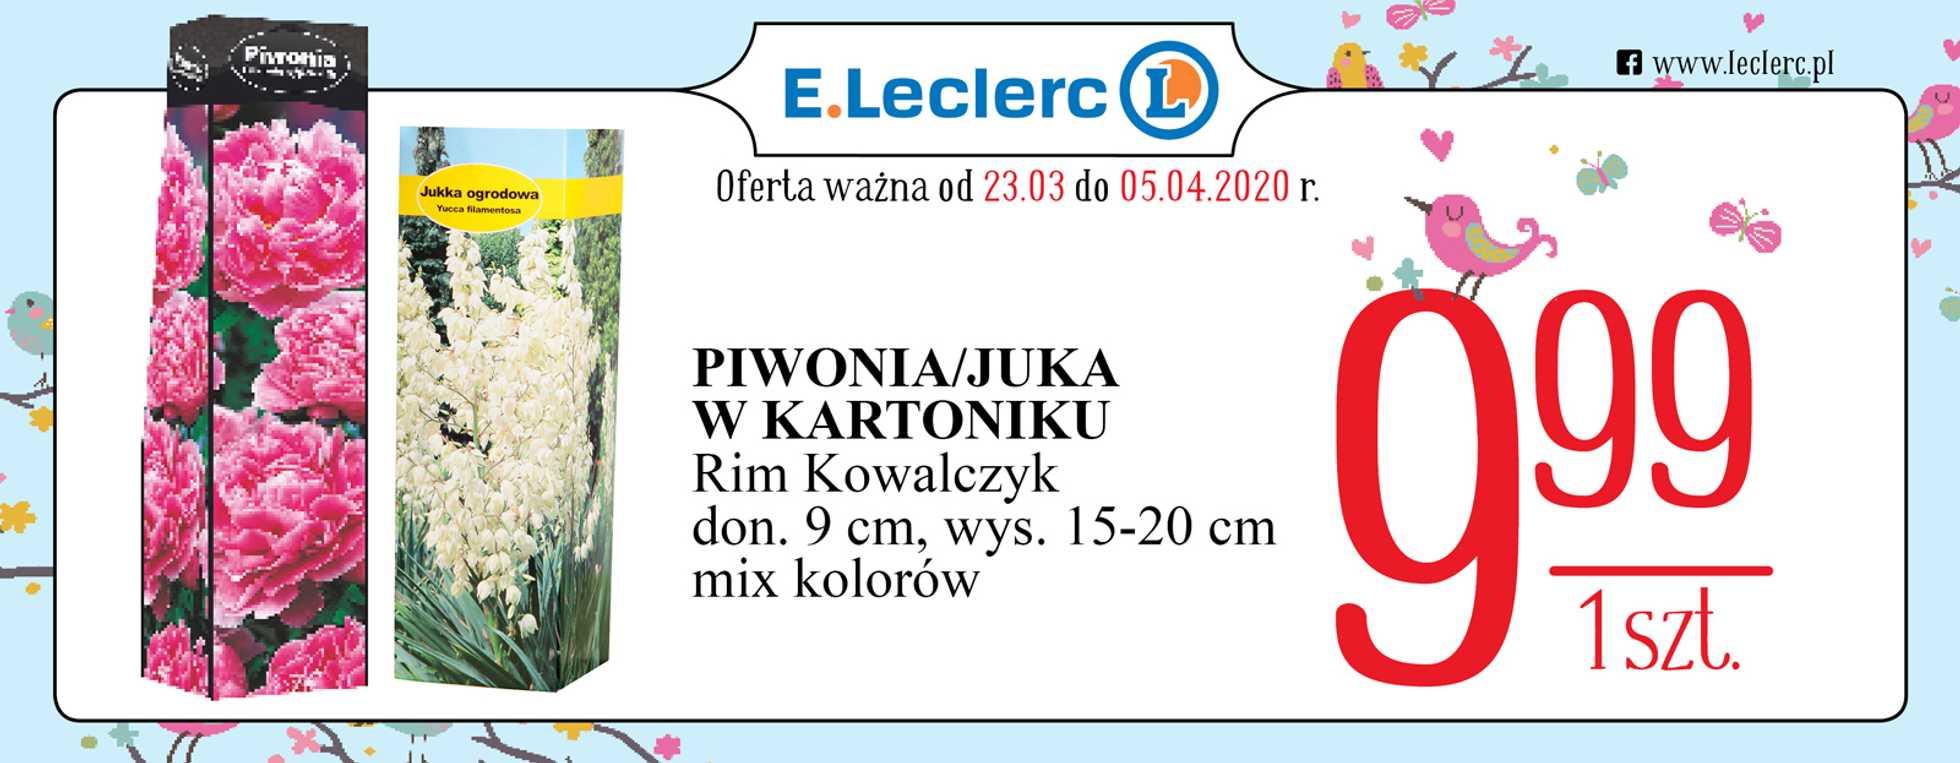 E.Leclerc - gazetka promocyjna ważna od 23.03.2020 do 05.04.2020 - strona 1.